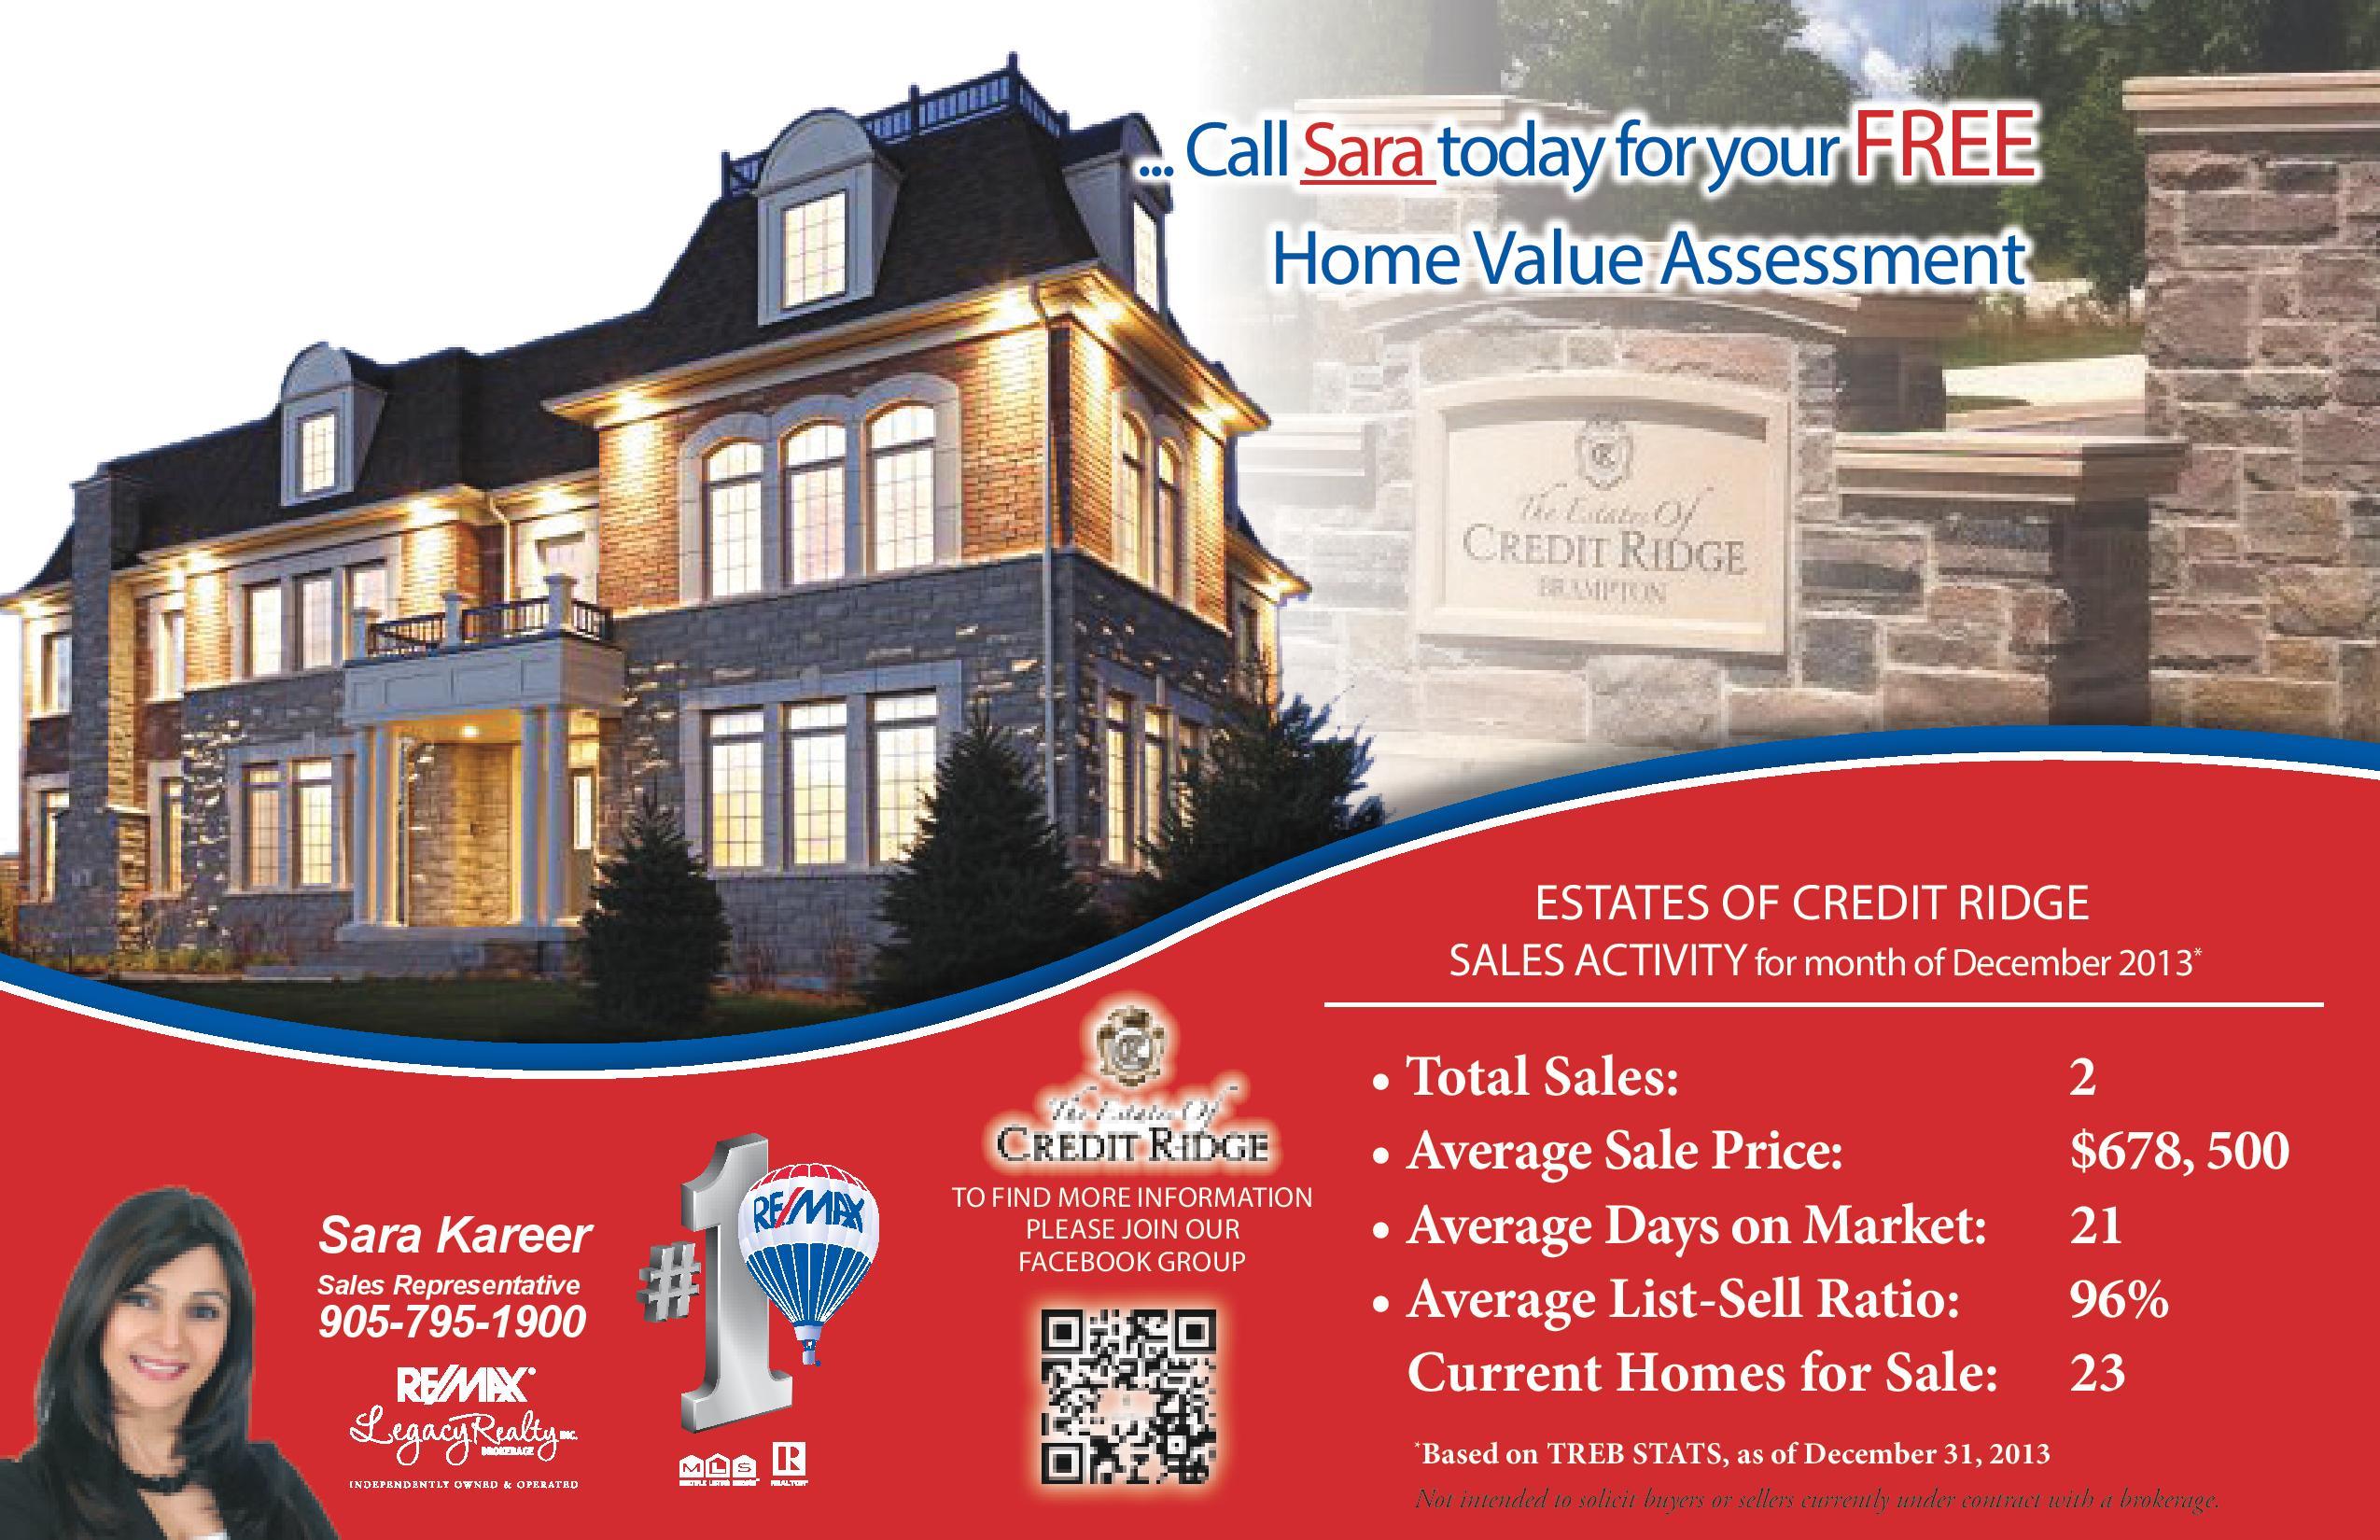 homes for estates of credit ridge brampton 2013 homes for estates of credit ridge brampton sara kareer remax